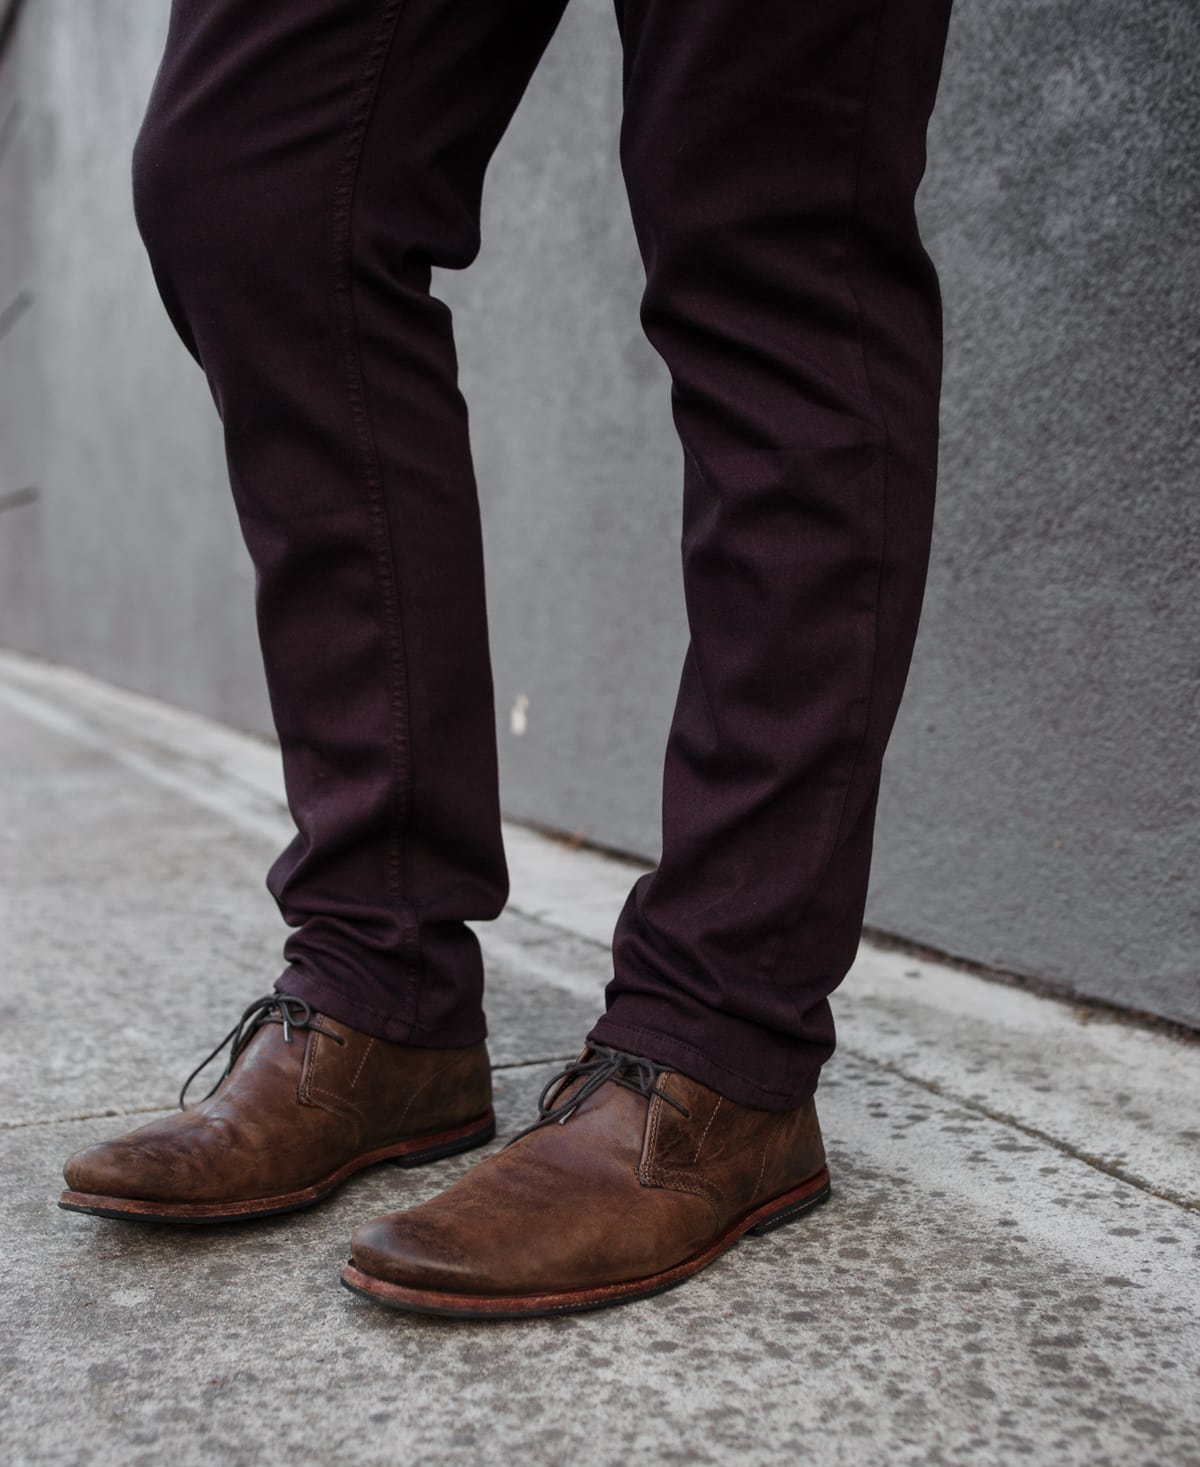 nordstrom mens shoes